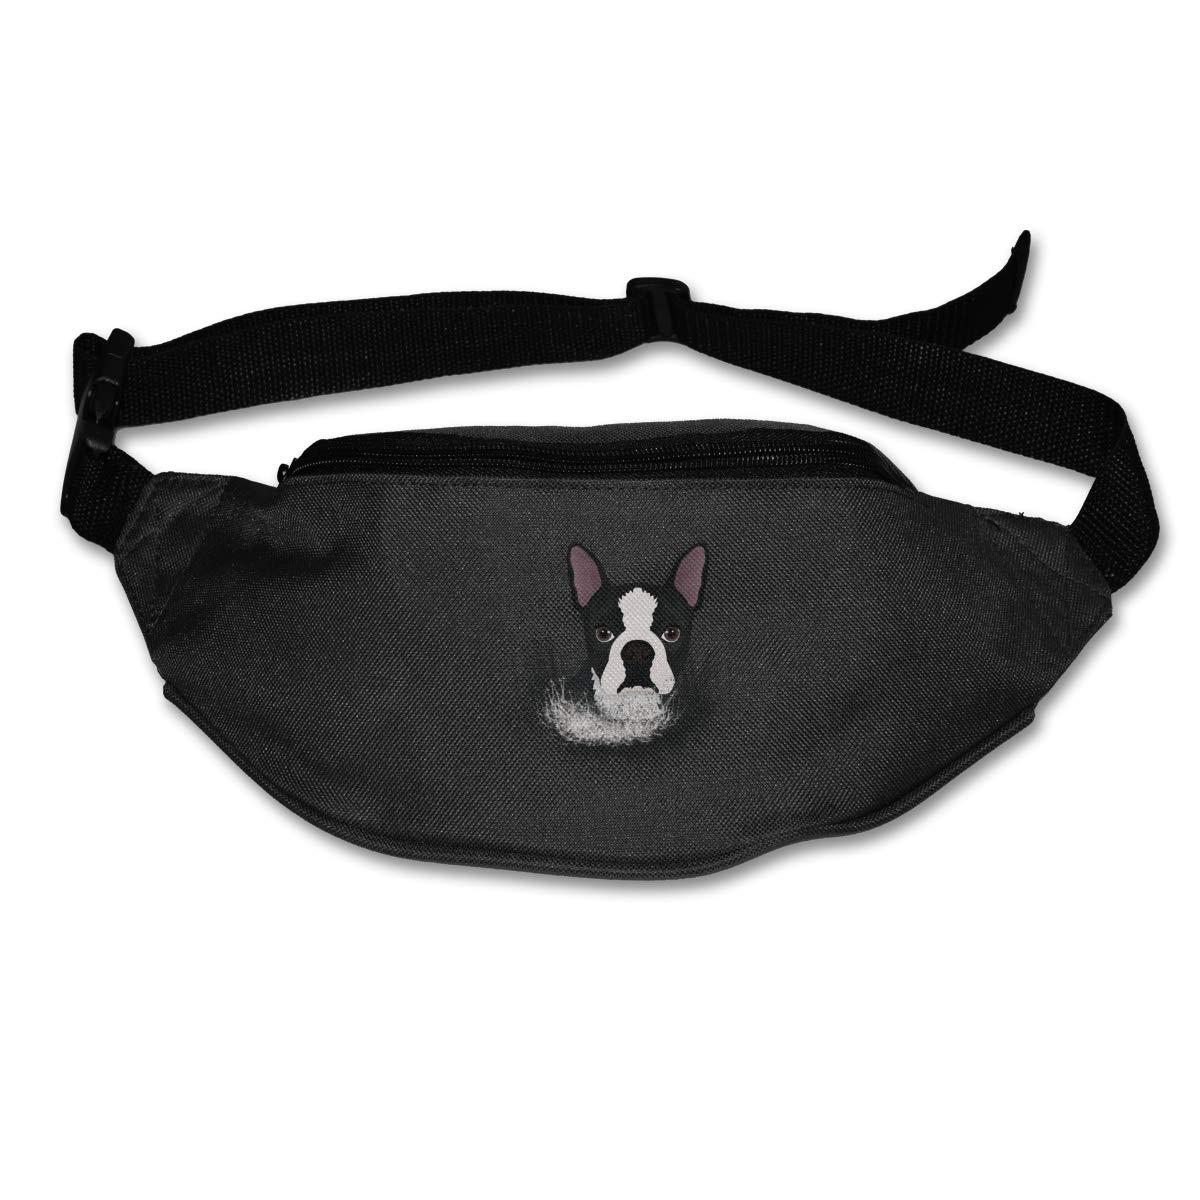 Puppy Boston Terrier Dog Sport Waist Bag Fanny Pack Adjustable For Hike